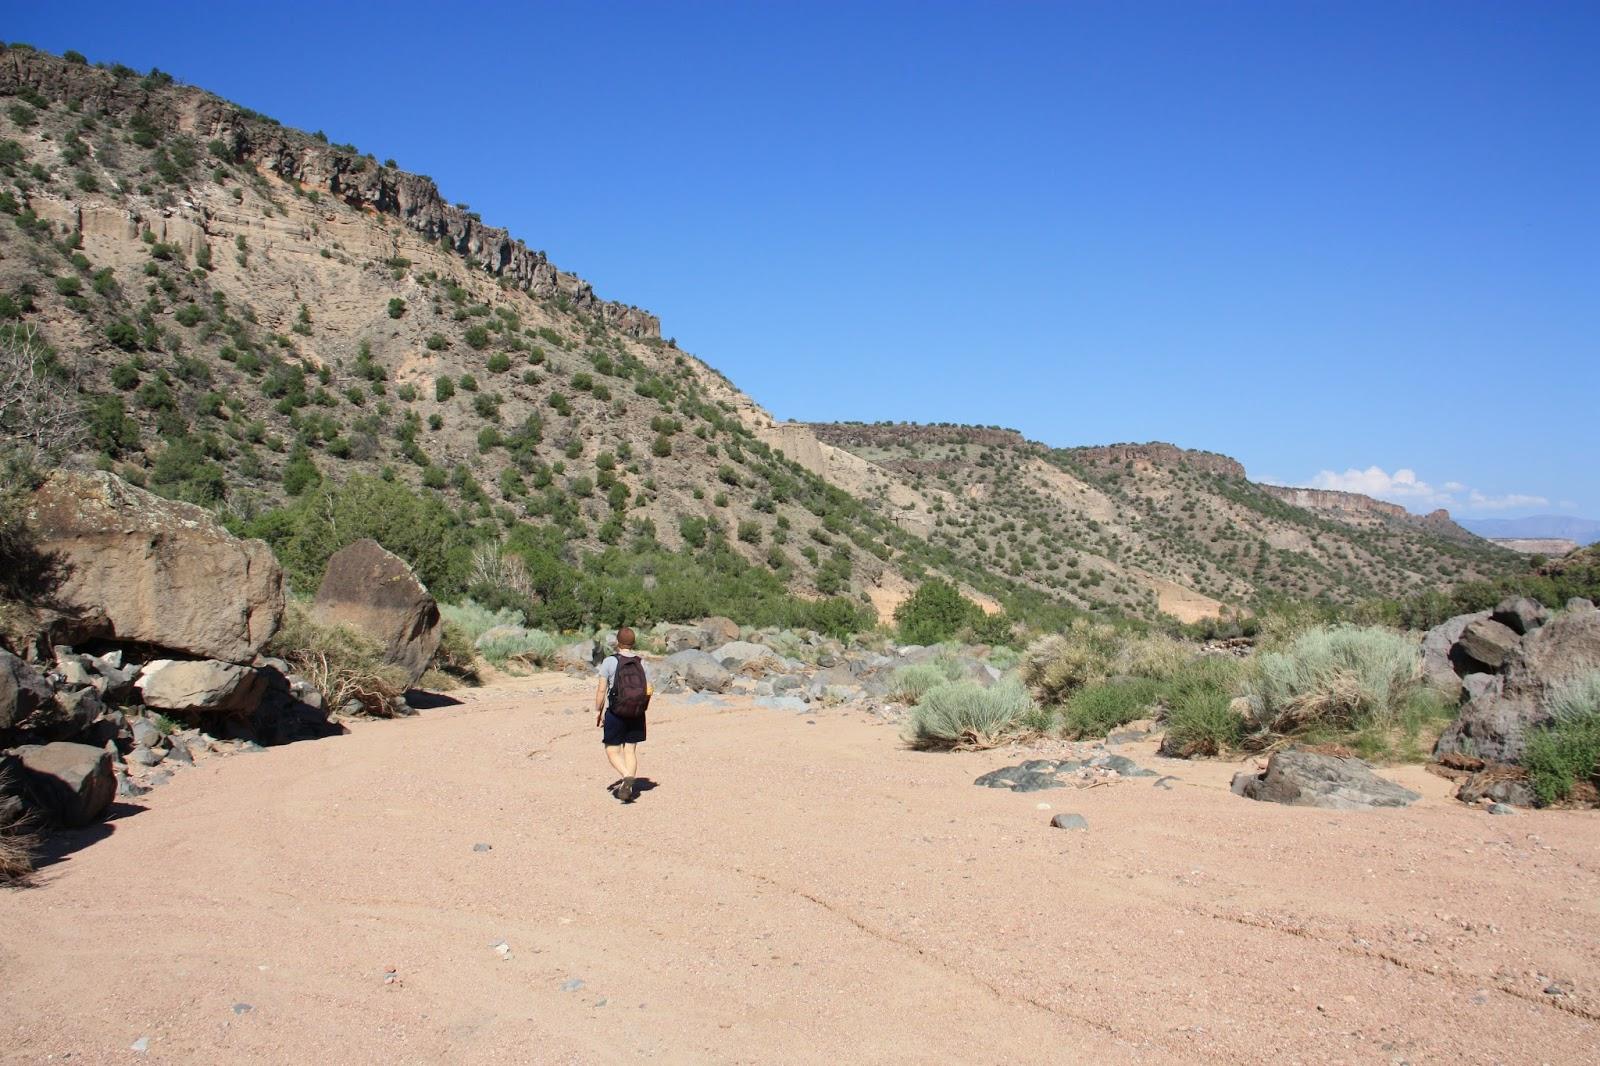 A Is For Adventure Diablo Canyon Hike Santa Fe